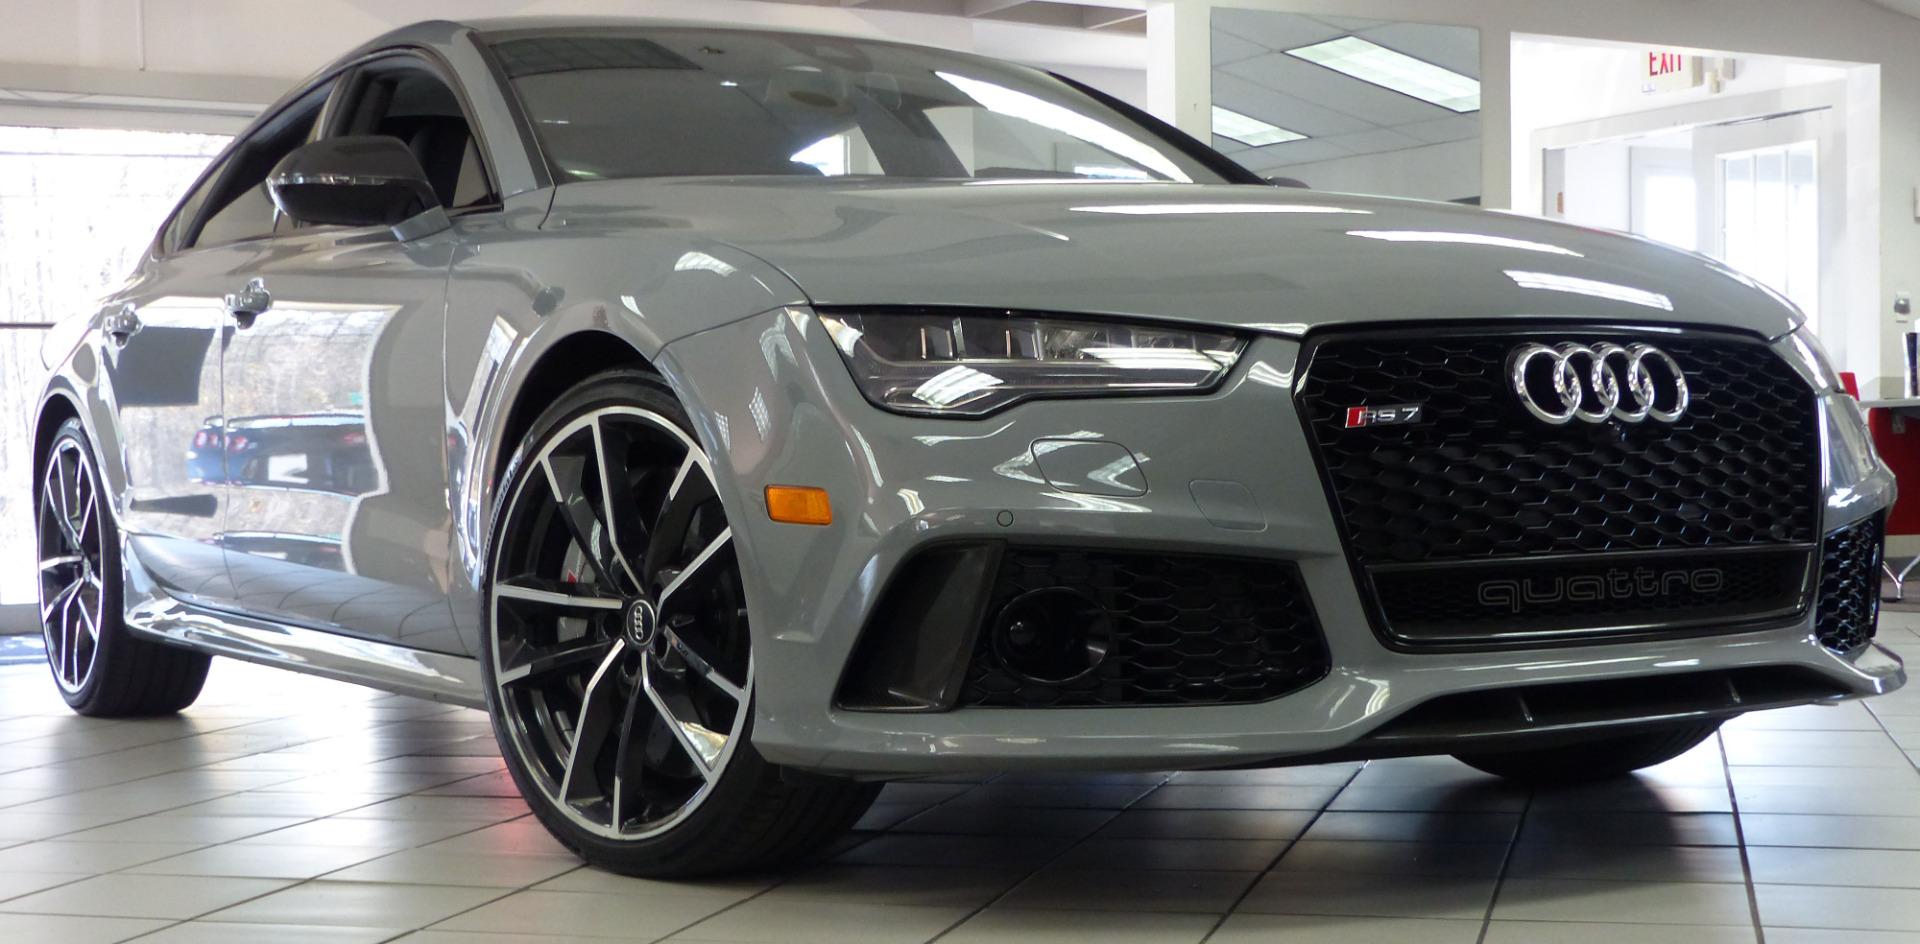 2017 Audi Rs 7 4.0 T Performance Prestige >> Used 2016 Audi Rs 7 4 0t Performance Prestige Marietta Ga